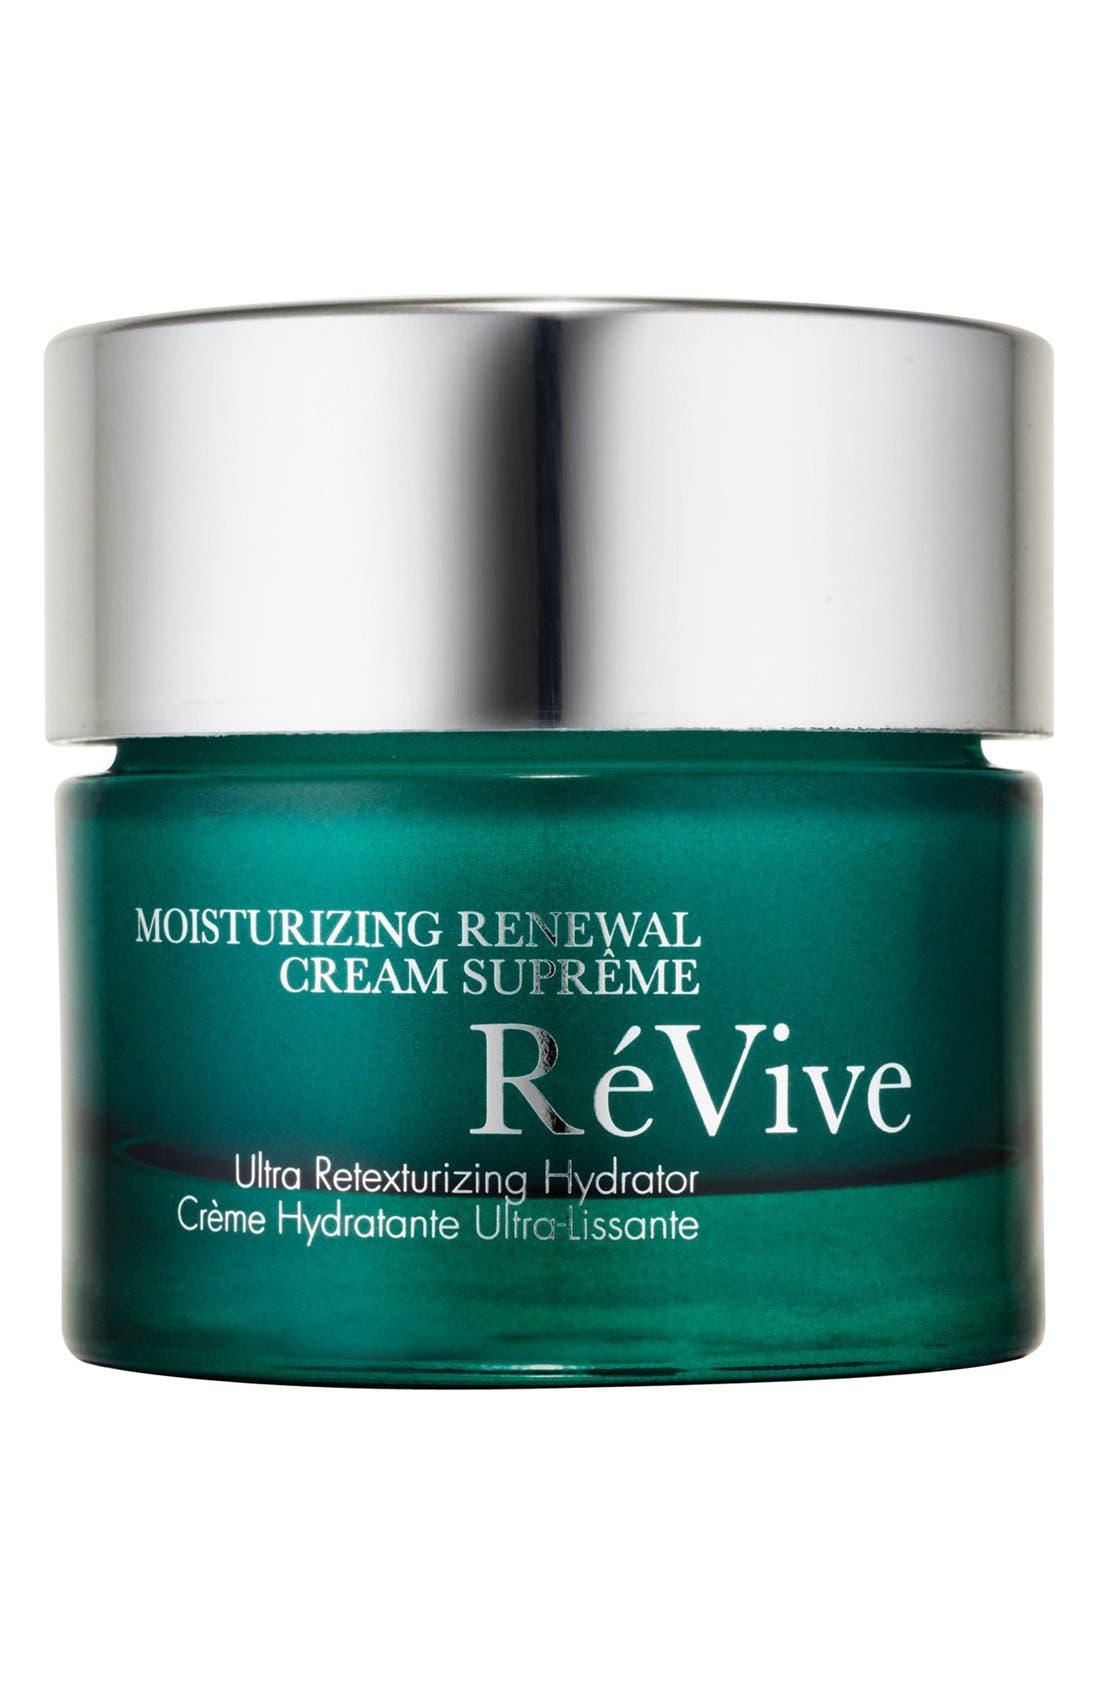 RéVive® Moisturizing Renewal Cream Suprême